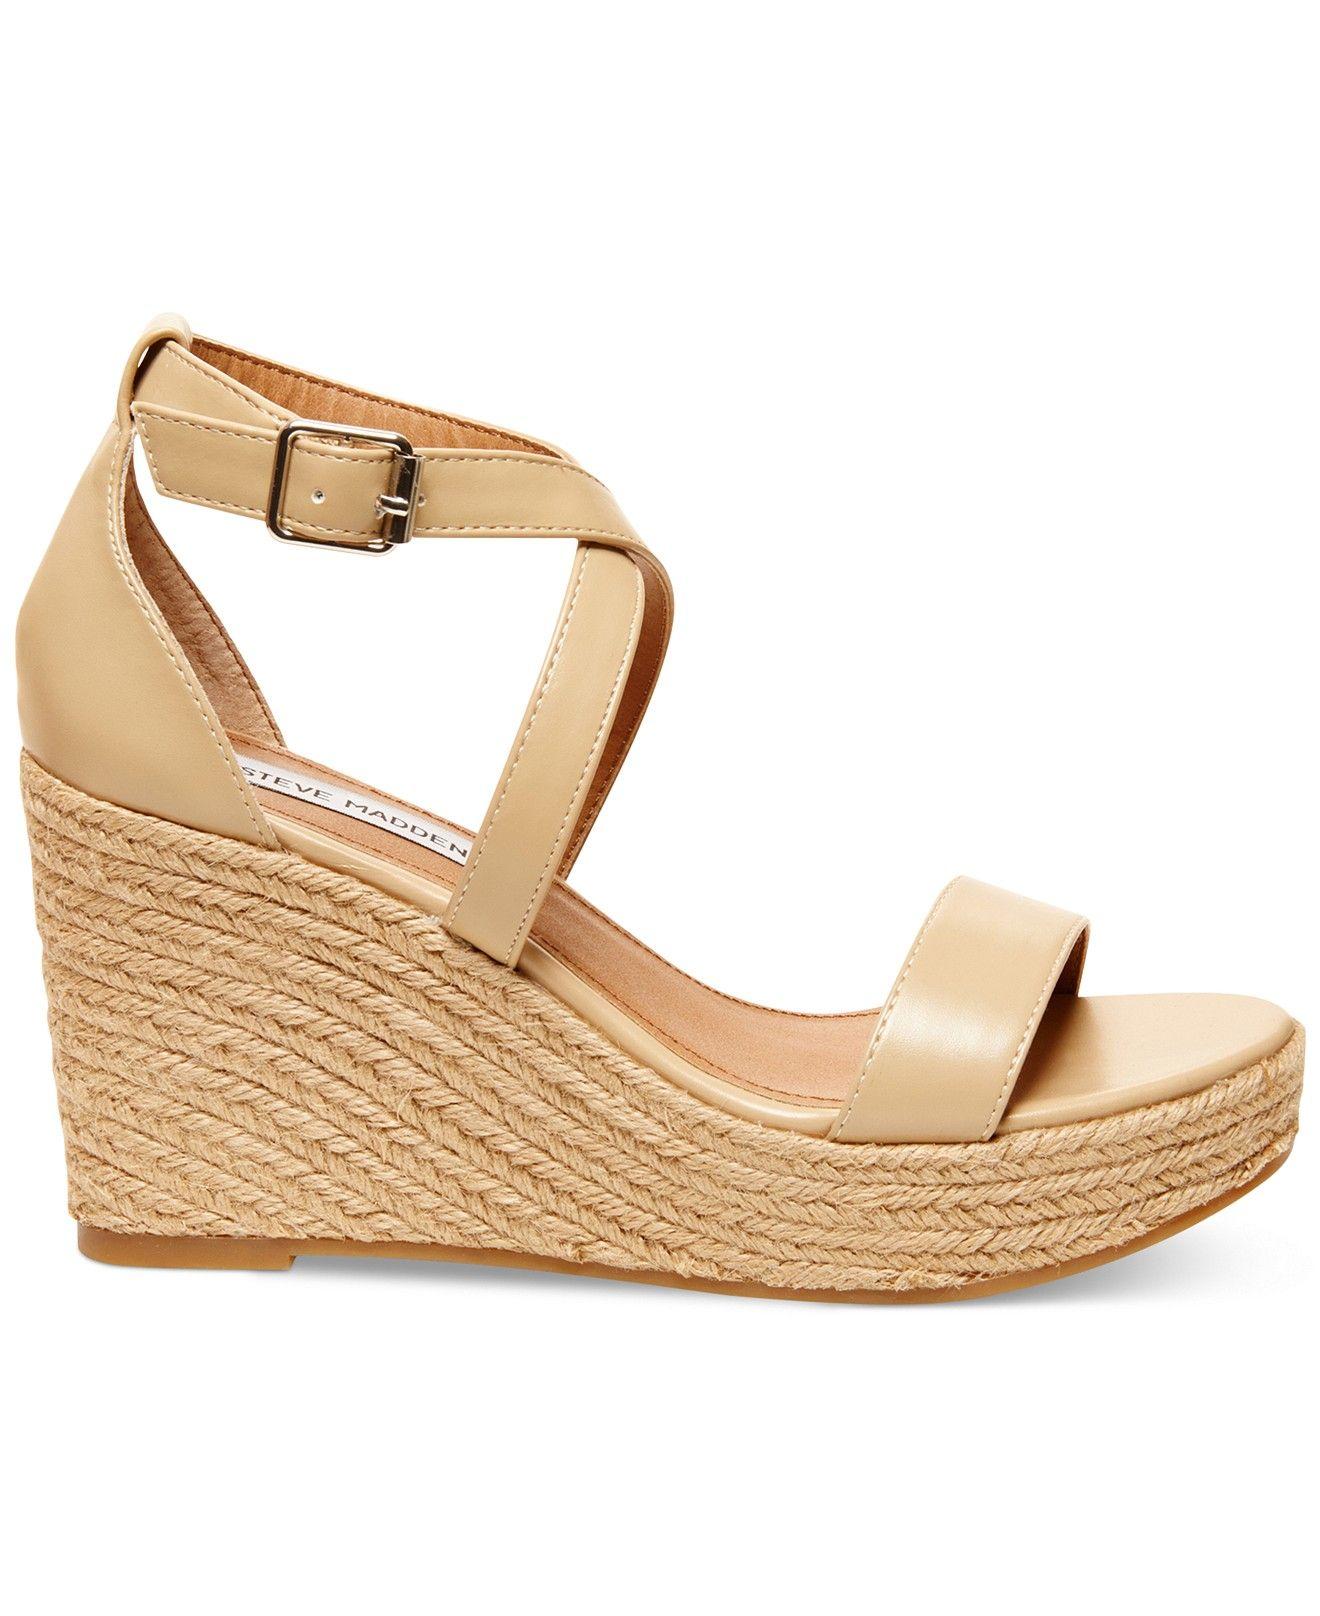 a112571acb01 Steve Madden Women s Montaukk Platform Wedge Sandals - Espadrilles - Shoes  - Macy s